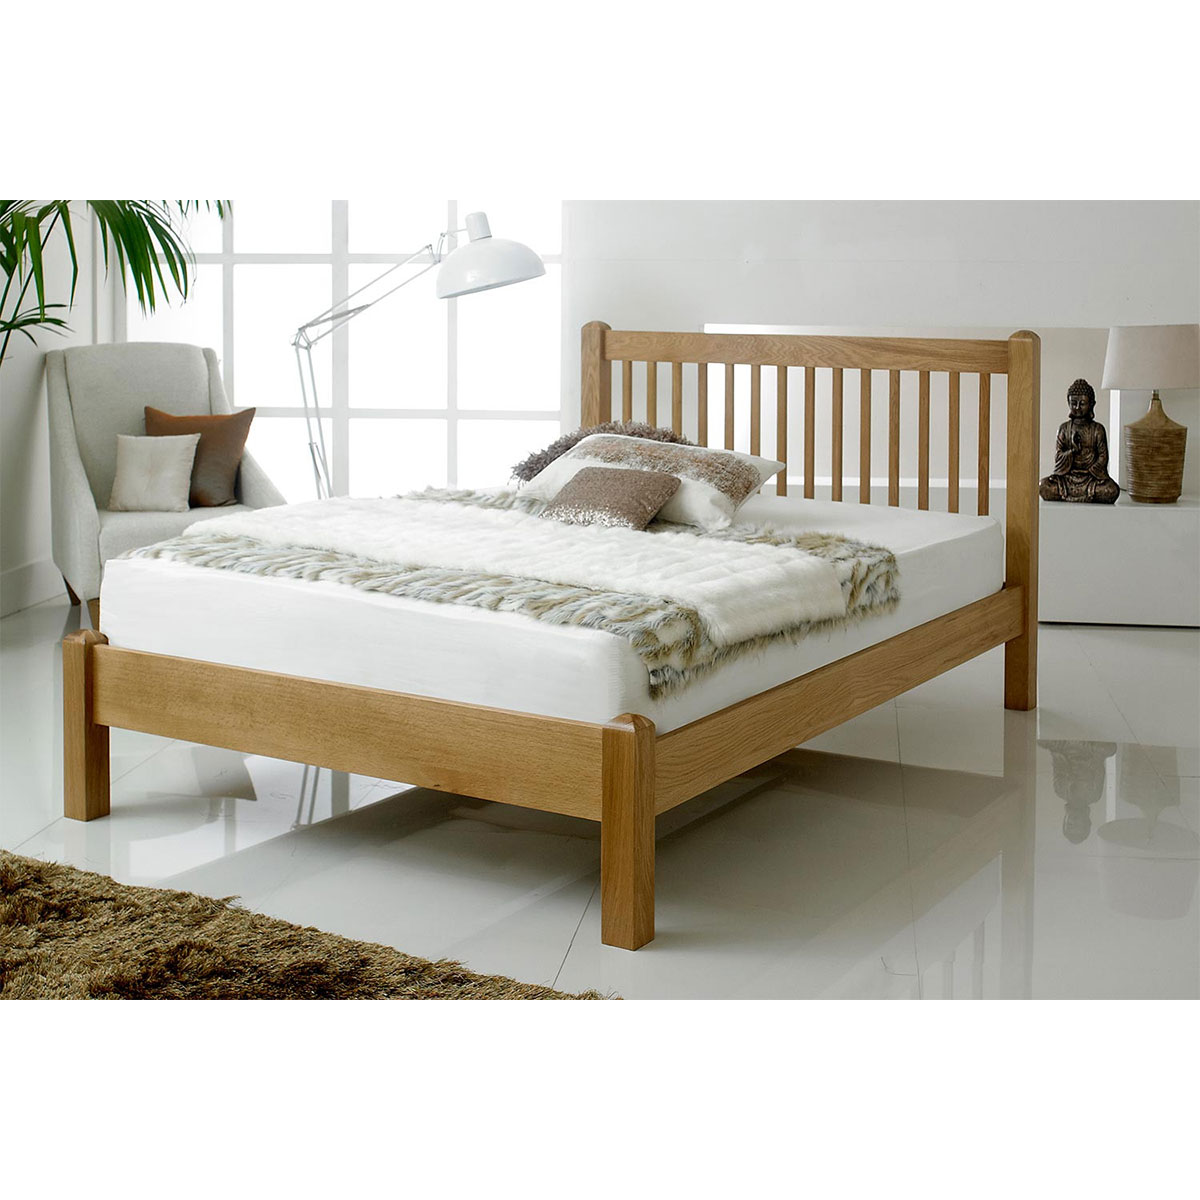 Giường đôi IBIE Trafagar gỗ sồi 2m